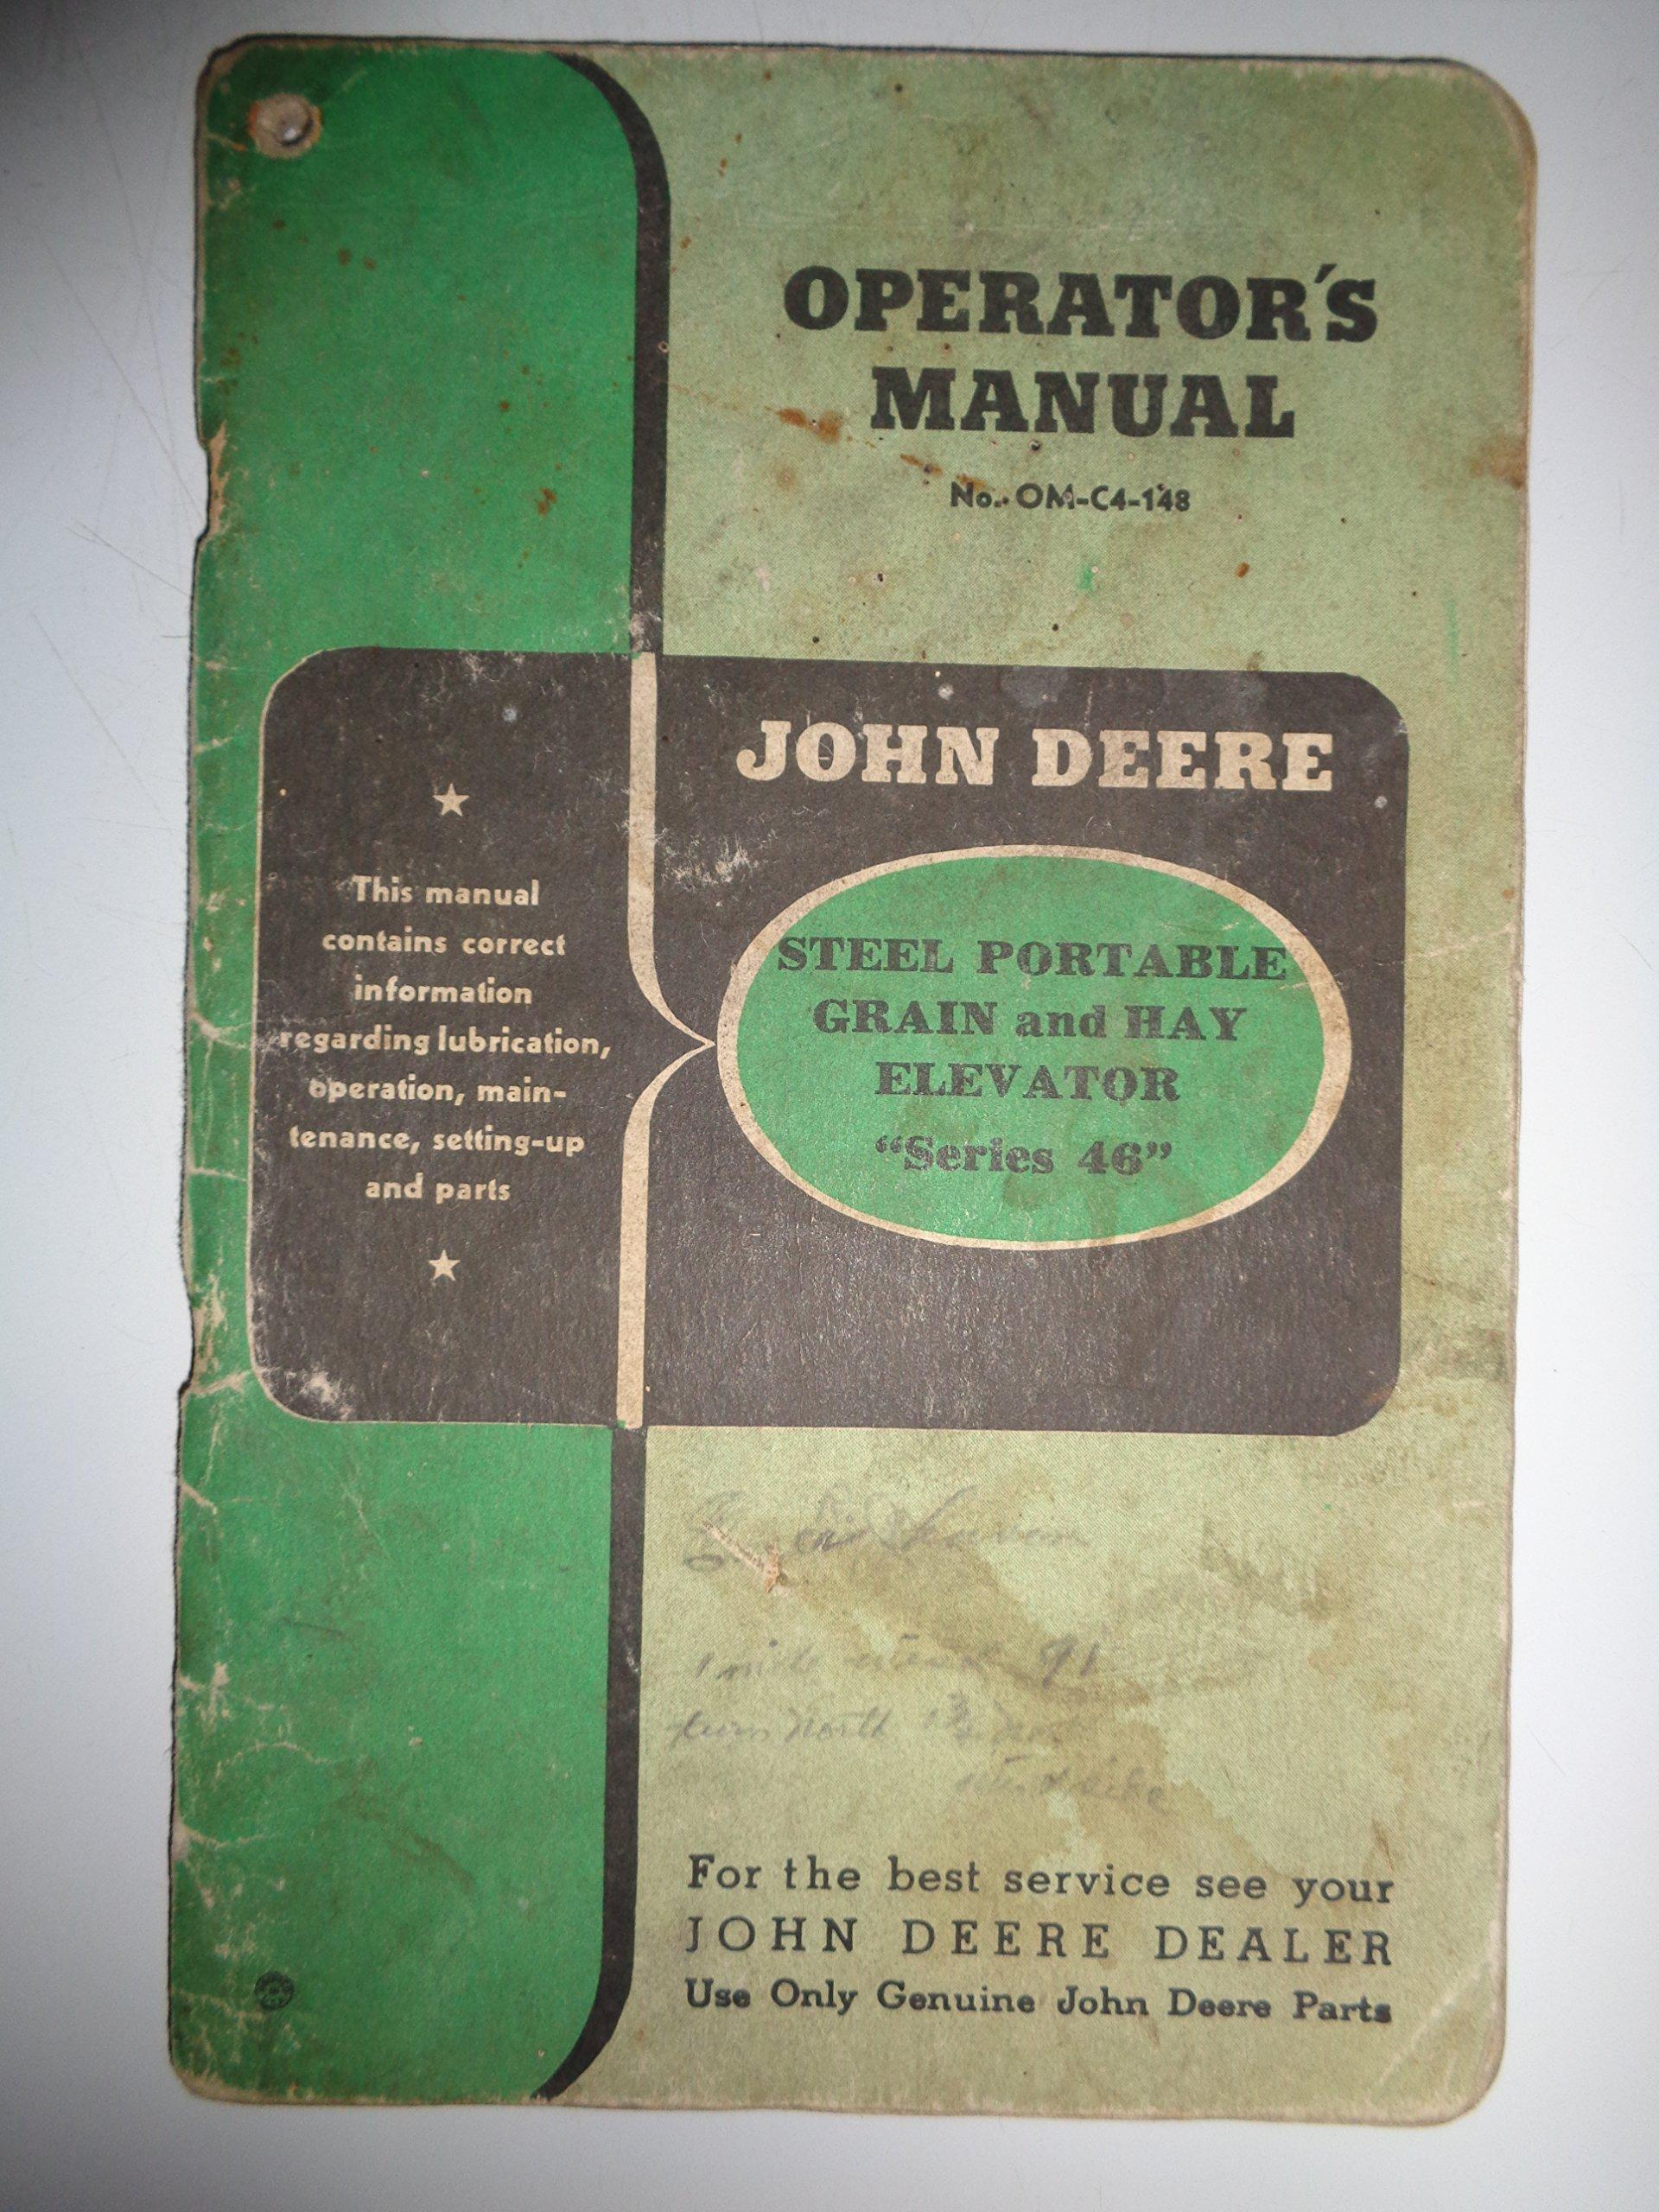 John Deere Series 46 Hay/Grain Portable Elevator Parts